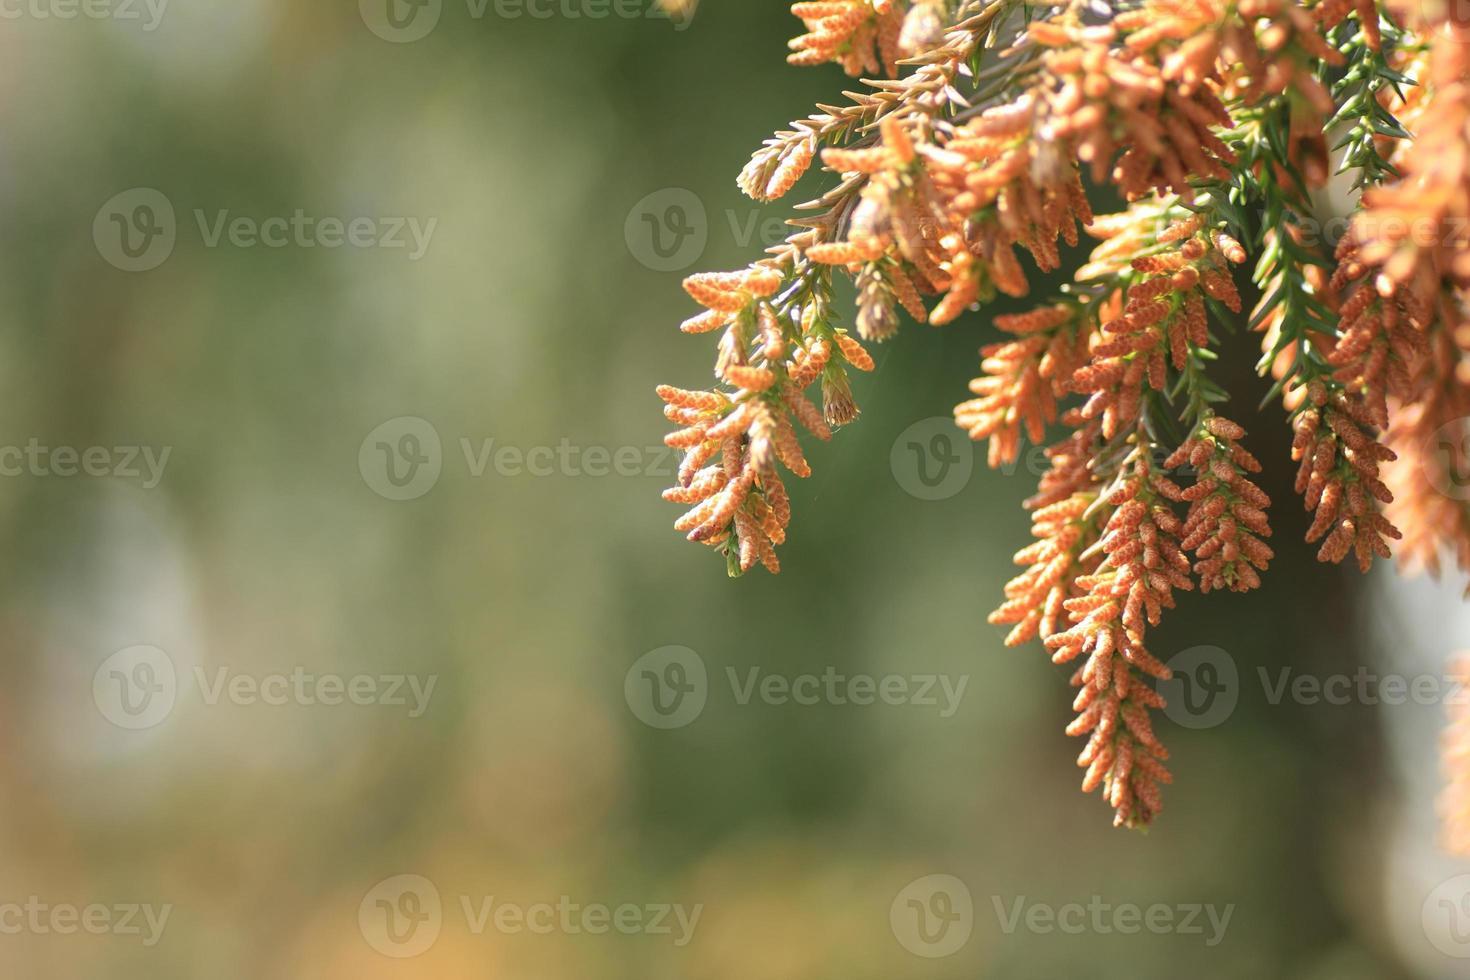 cederpollenallergi foto